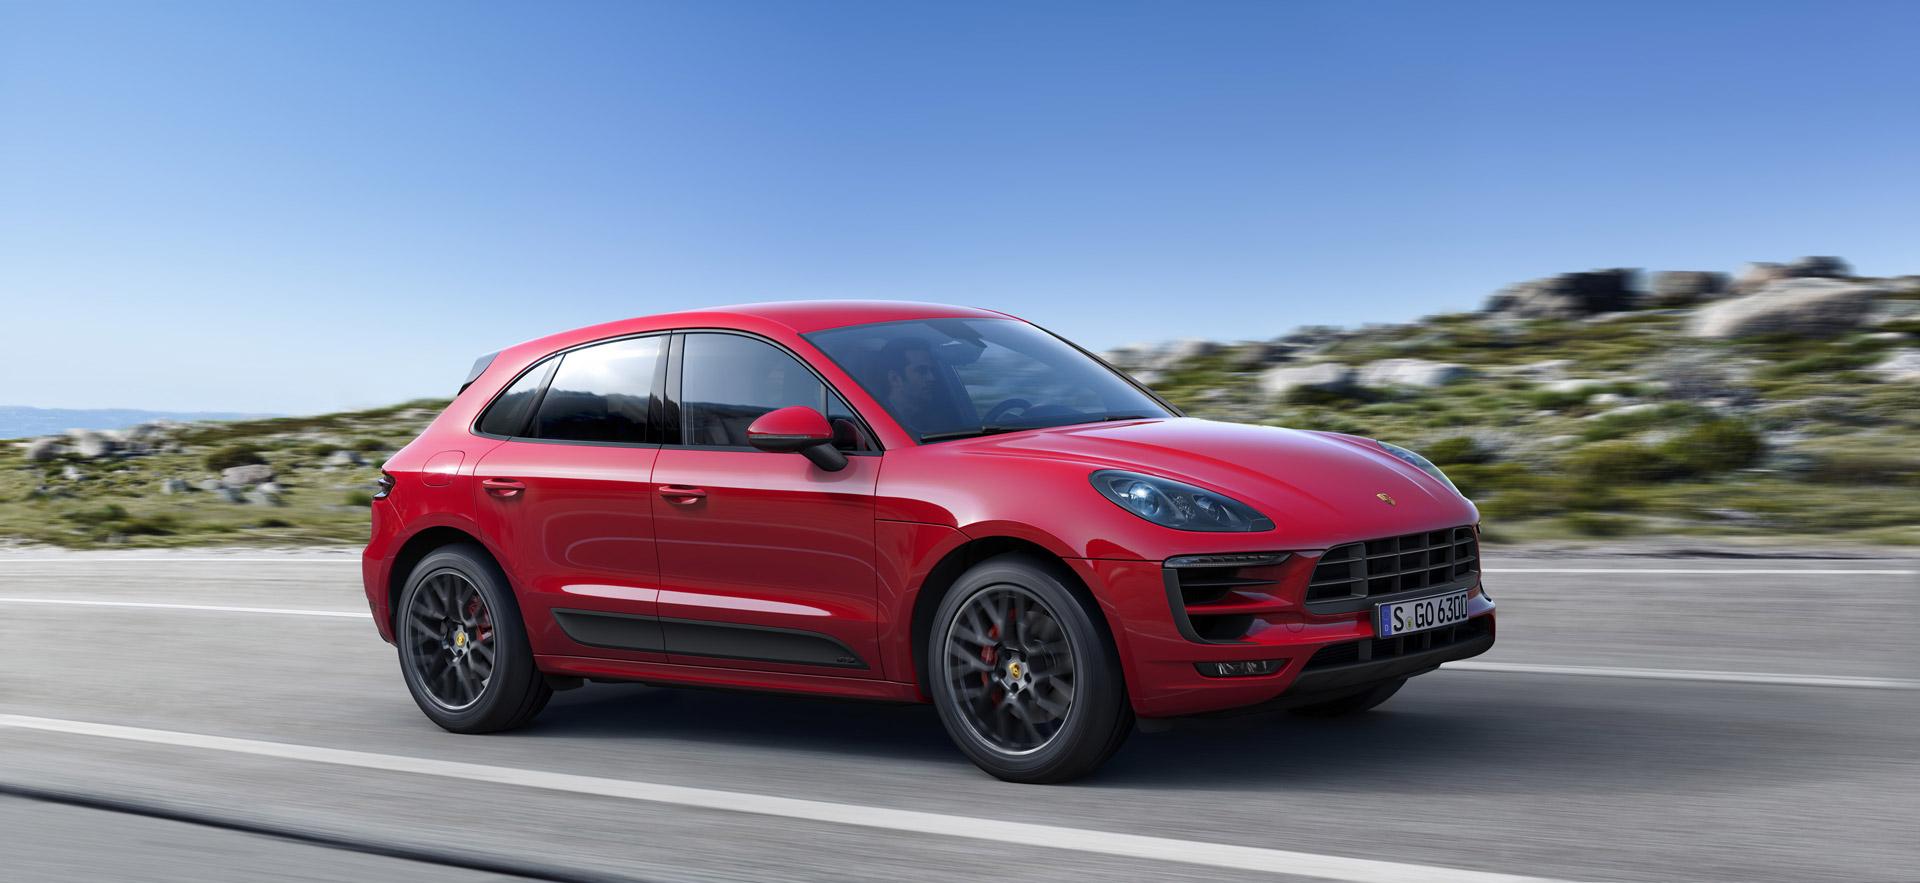 Volkswagen dieselgate update fix deadline may pass again mercedes sued for diesel cheating